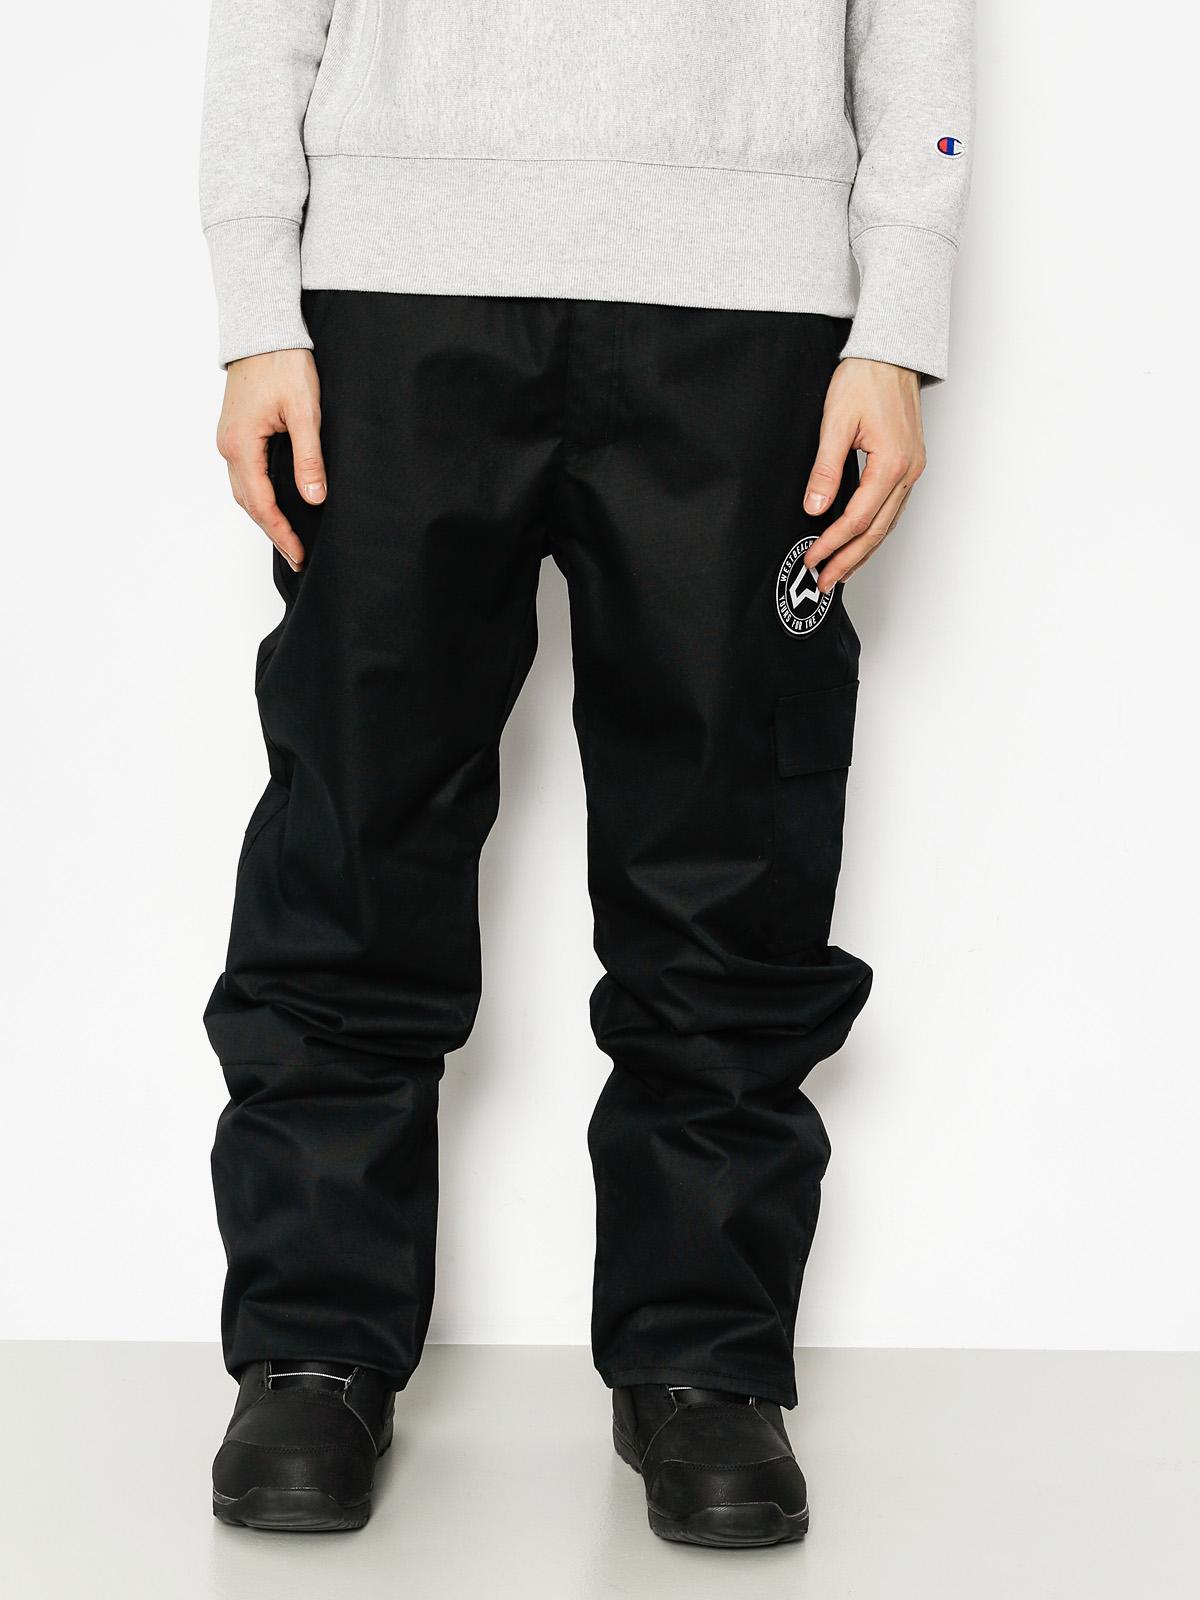 Westbeach Snowboard pants Upstart Pant (black)